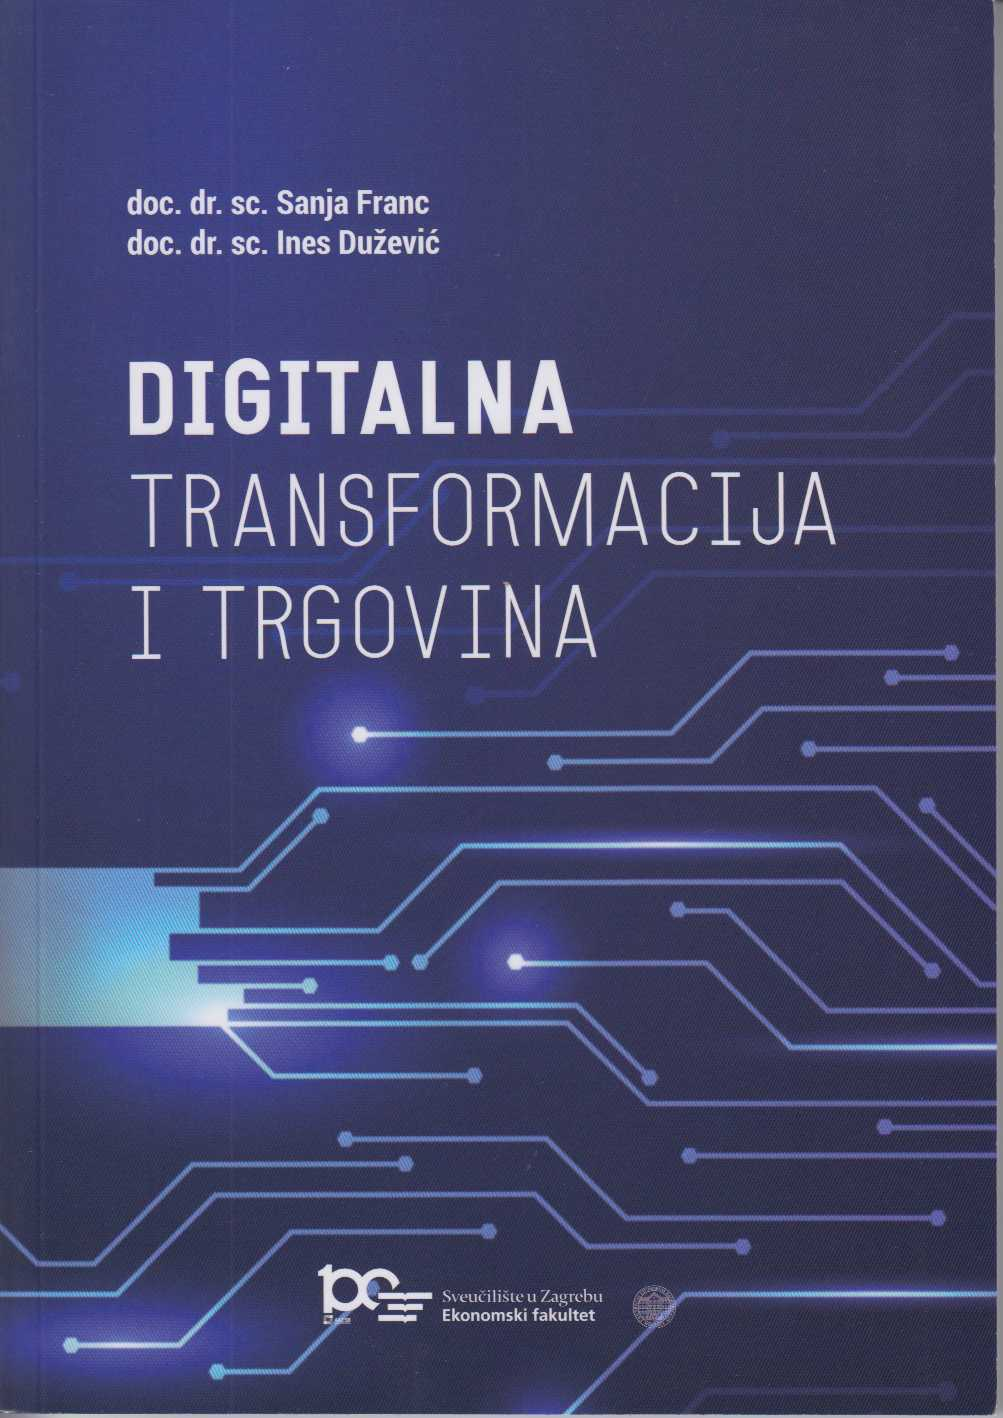 Digitalna transformacija i trgovina